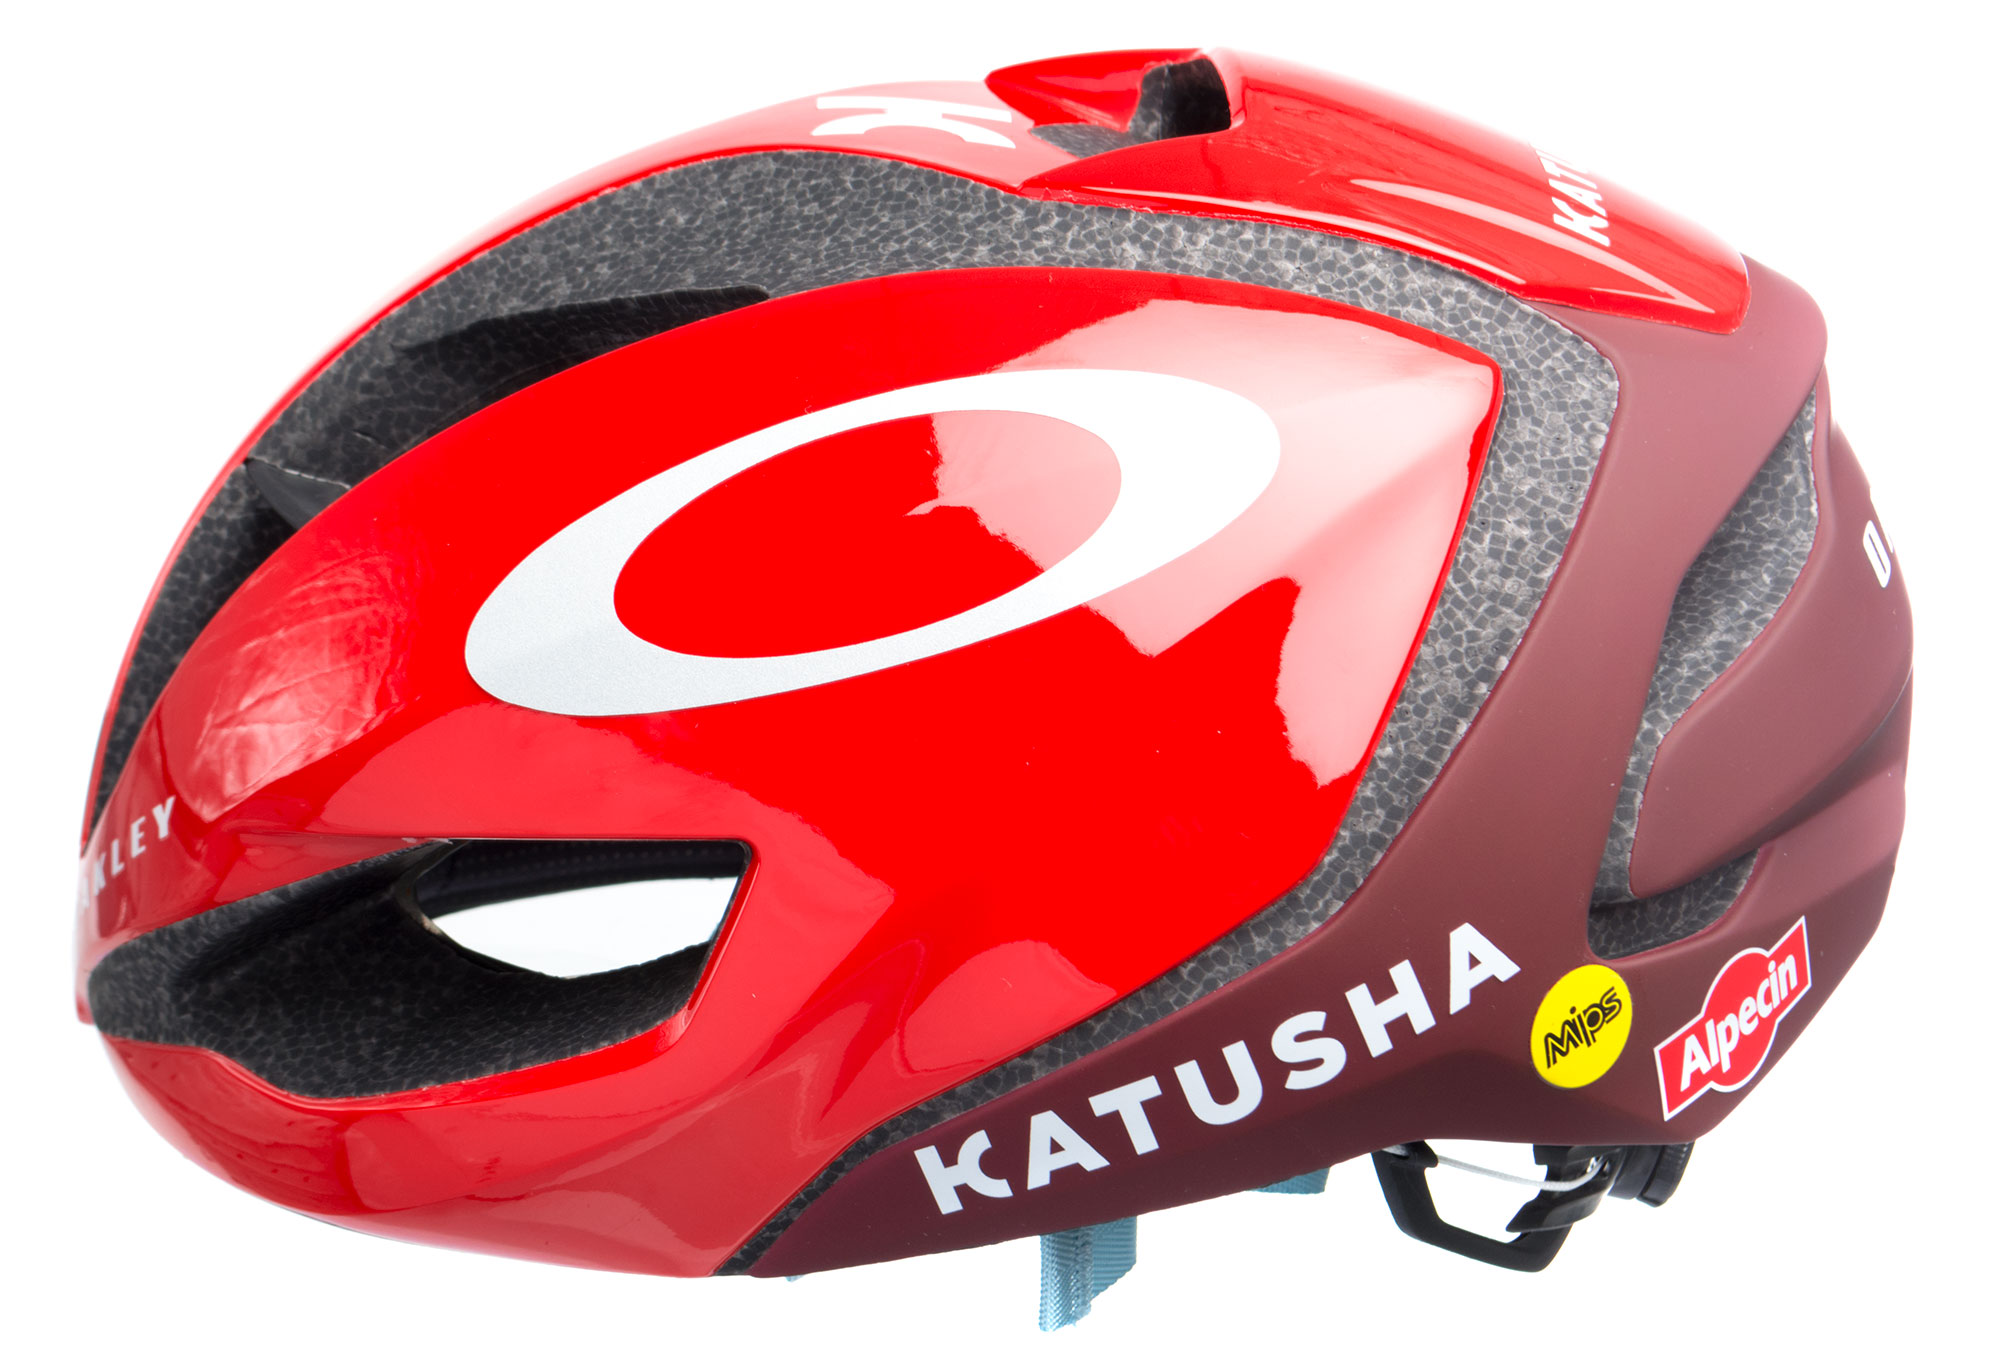 45f4a5f2c Oakley Helmet ARO5 Mips Team Katusha Alpecin Rouge